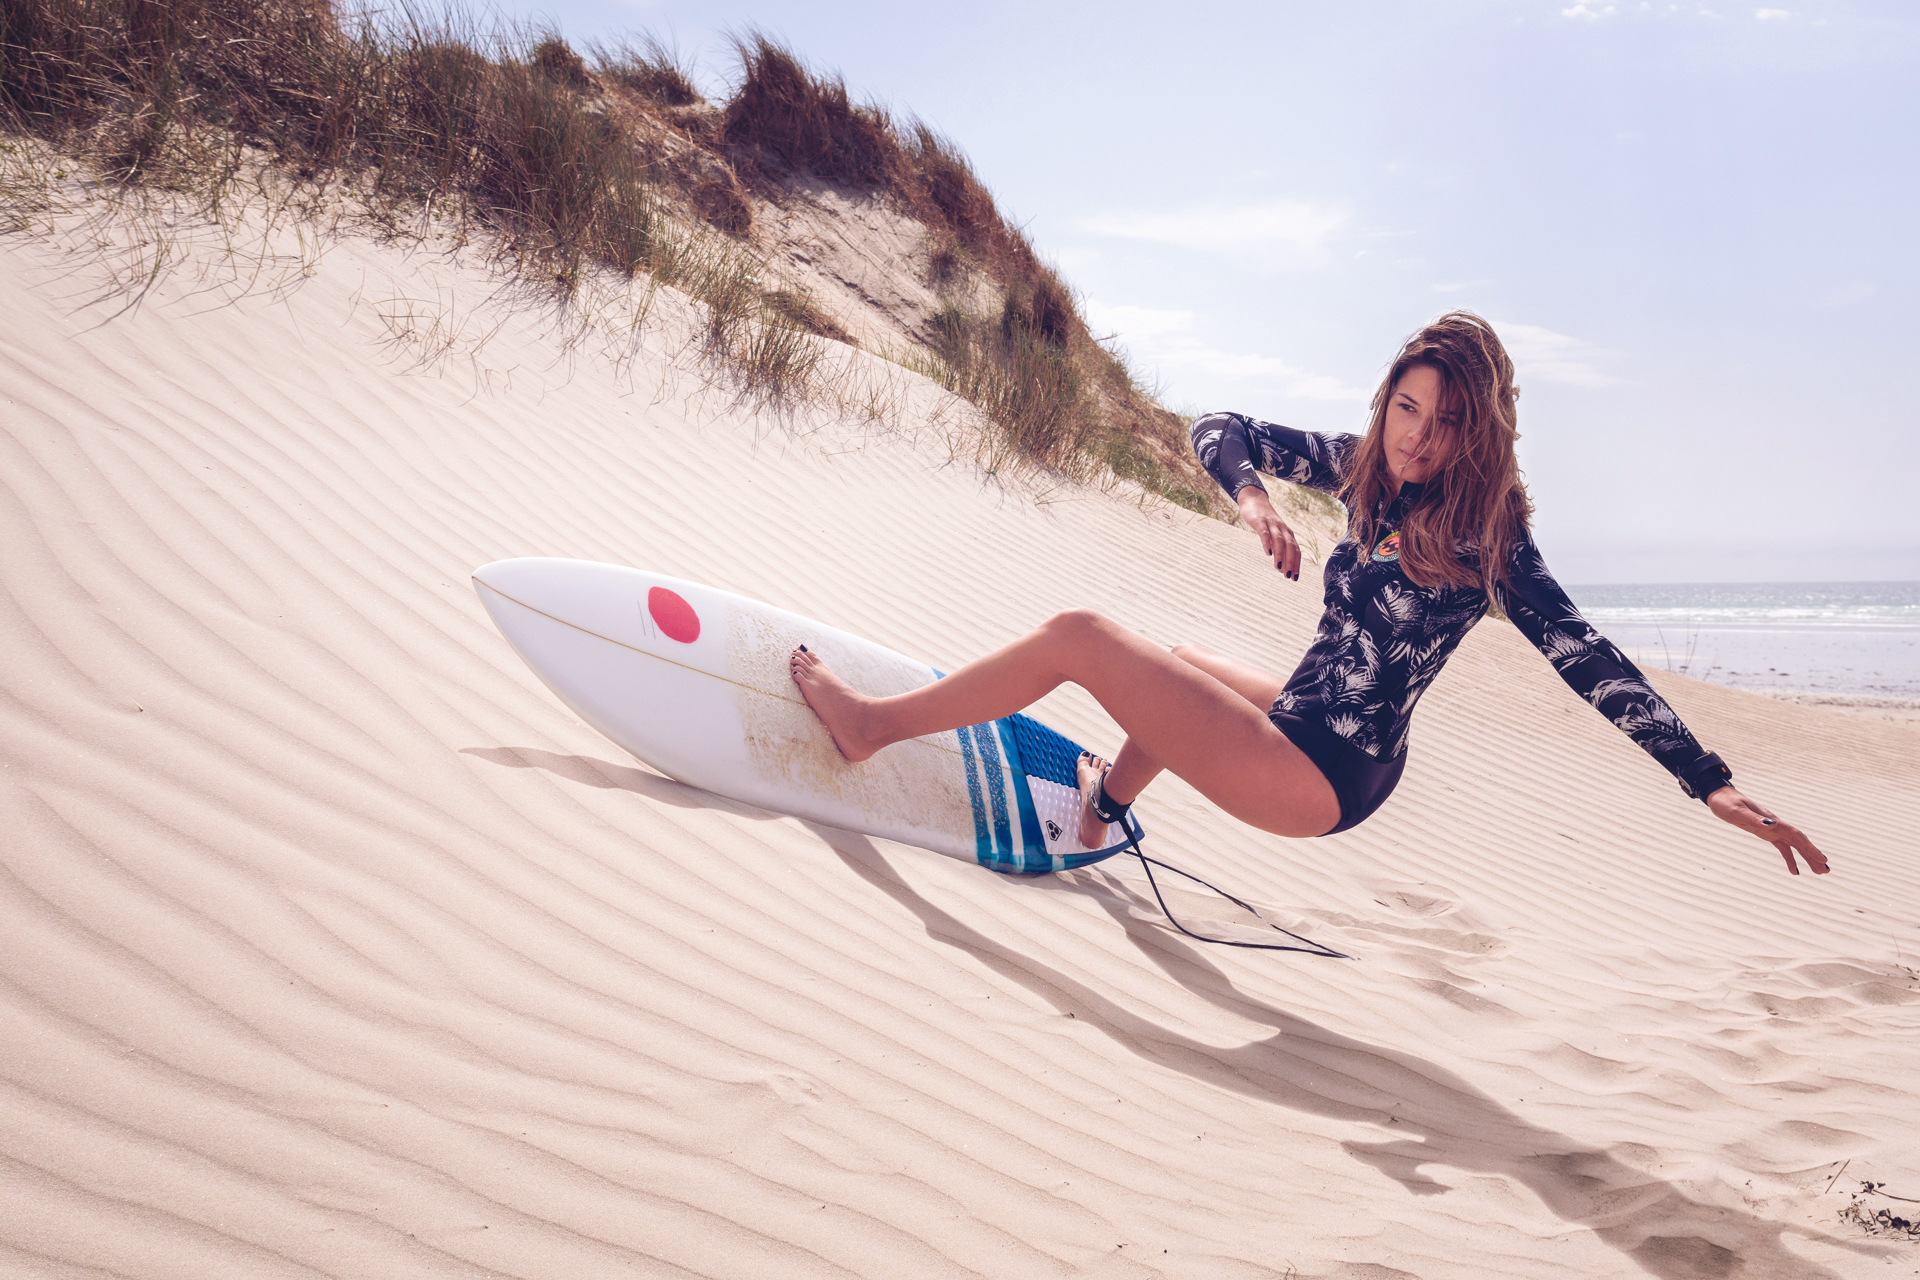 Thea_SandSurfing_R_Lr_LT.jpg